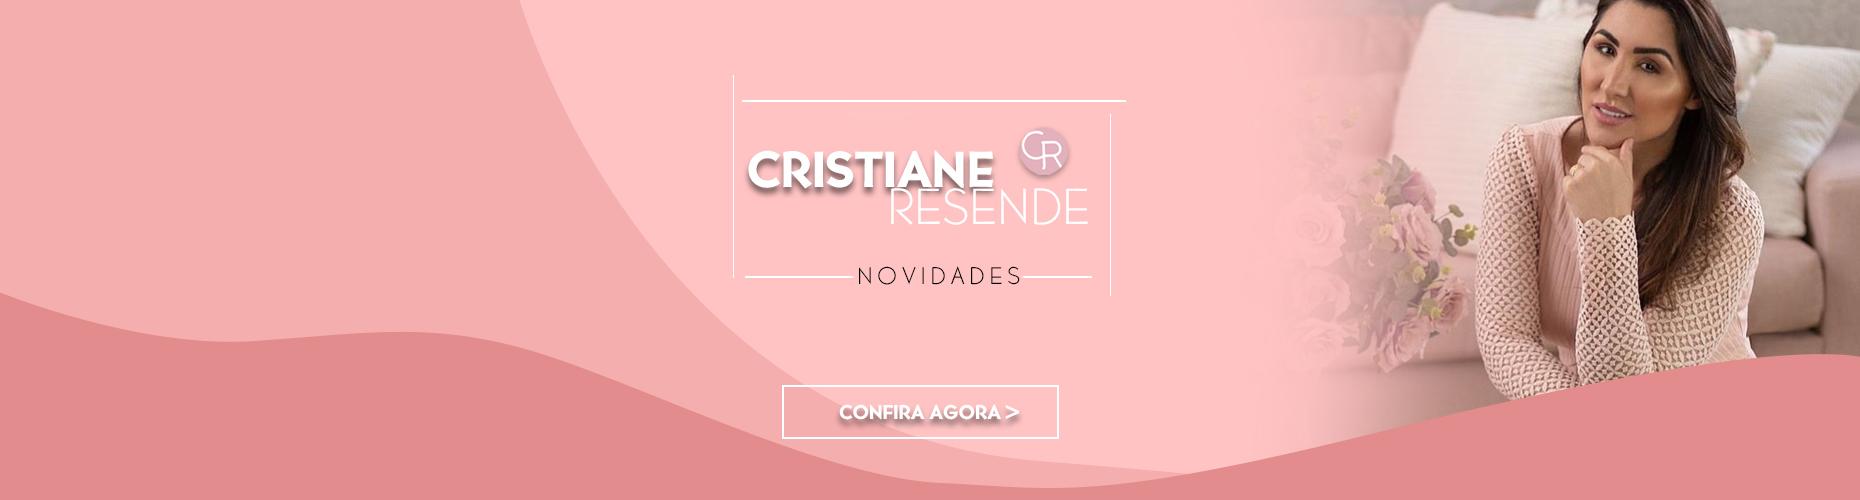 Cristiane Resende